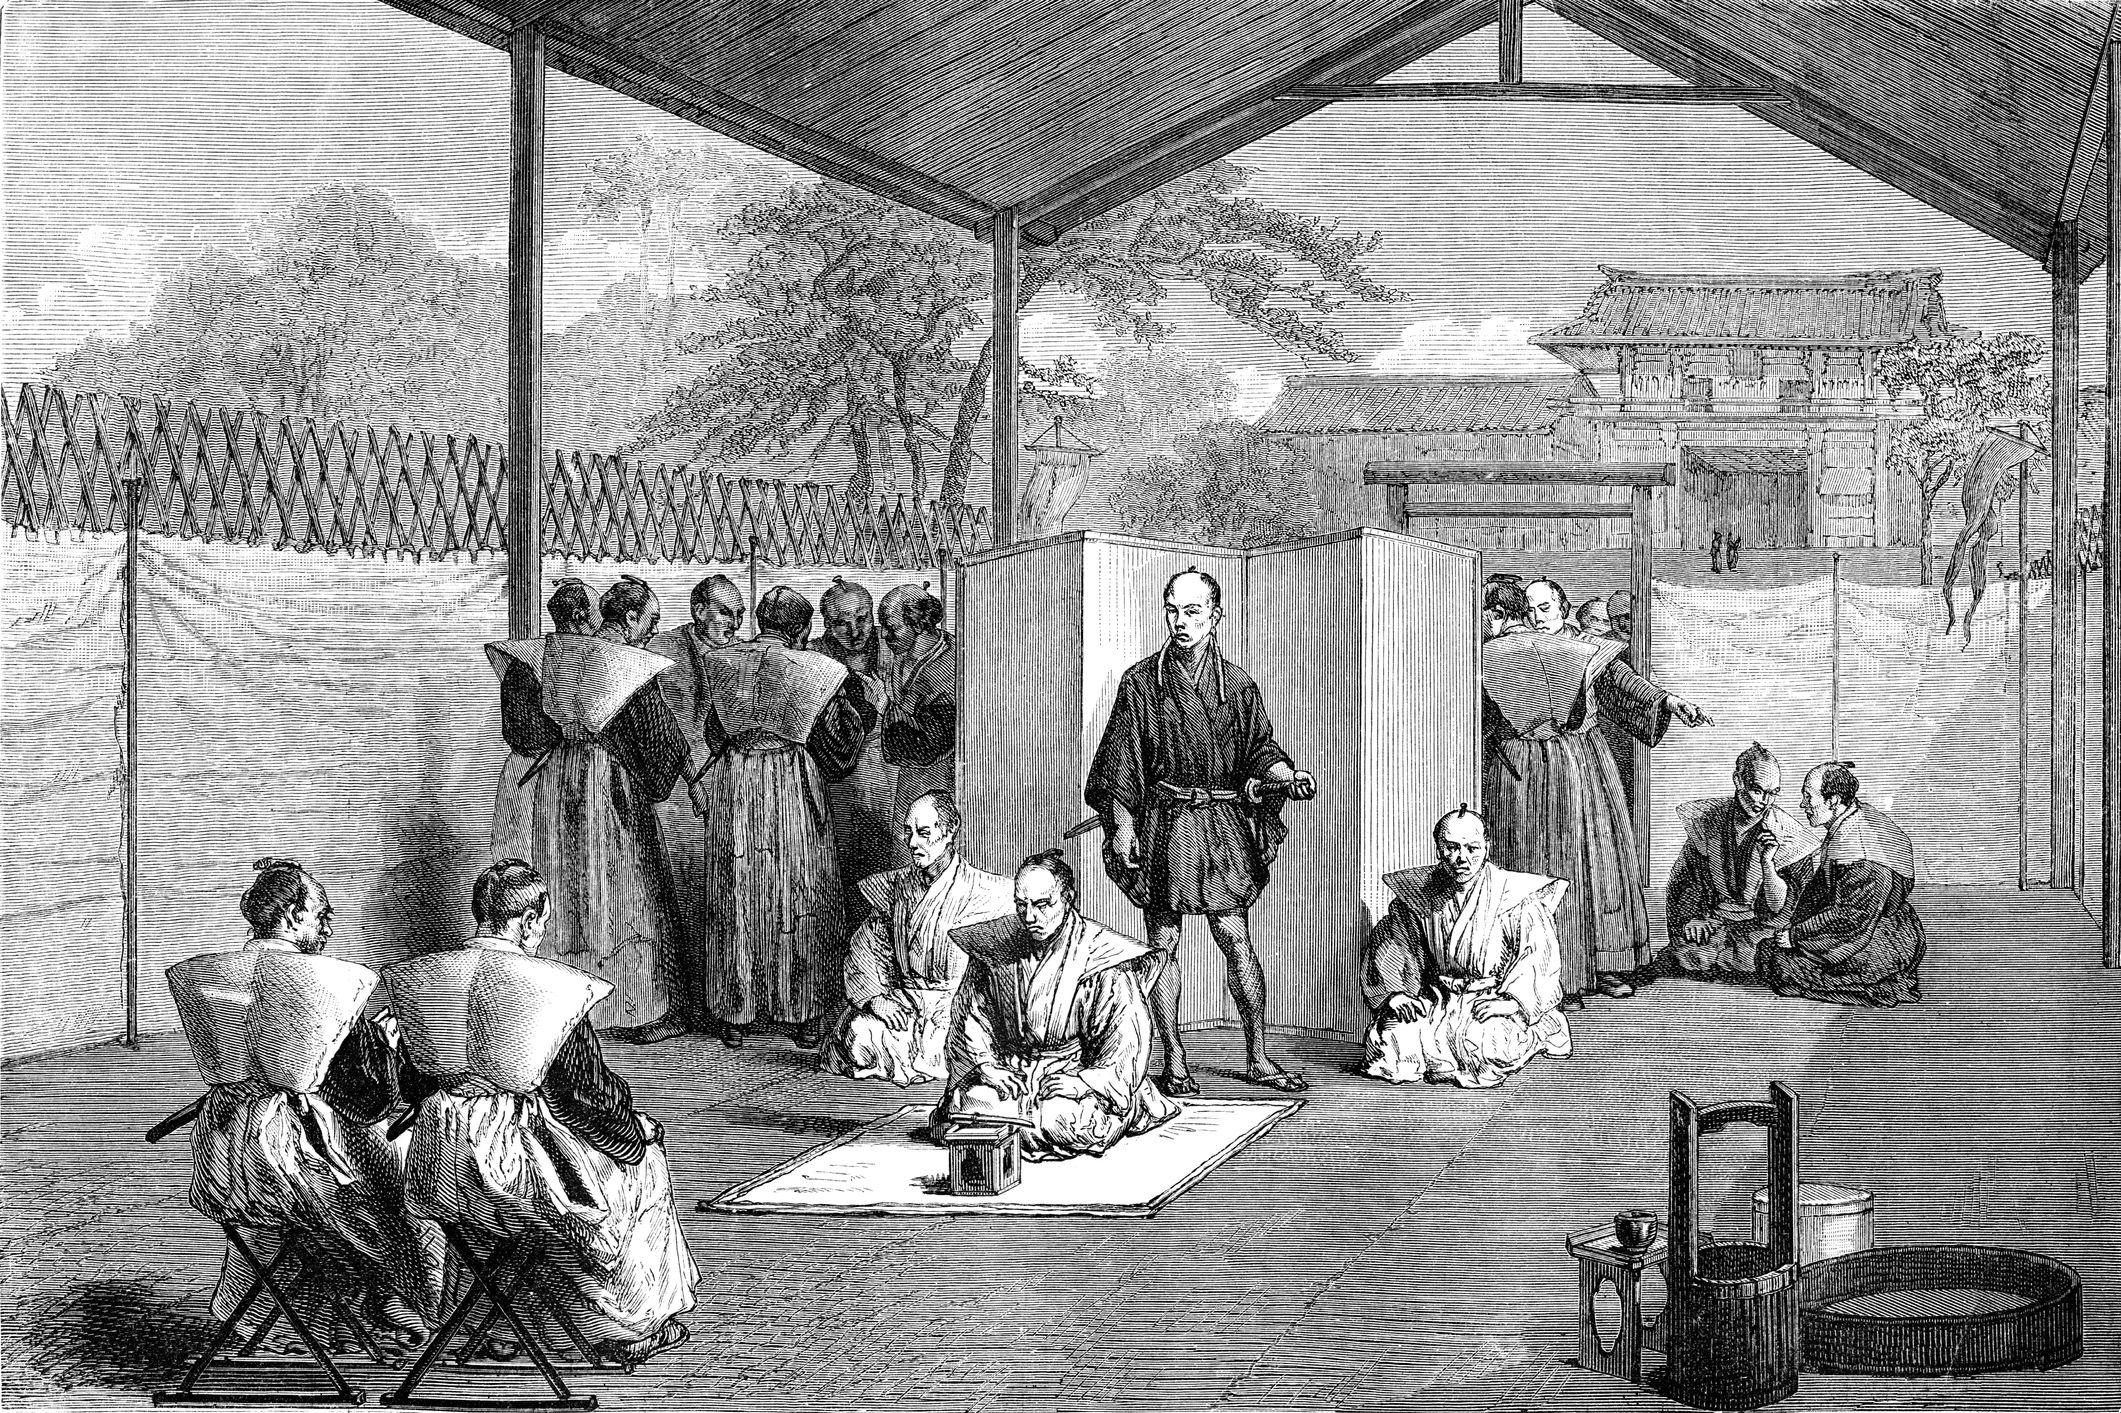 Illustration of samurai preparing for public ritual seppuku